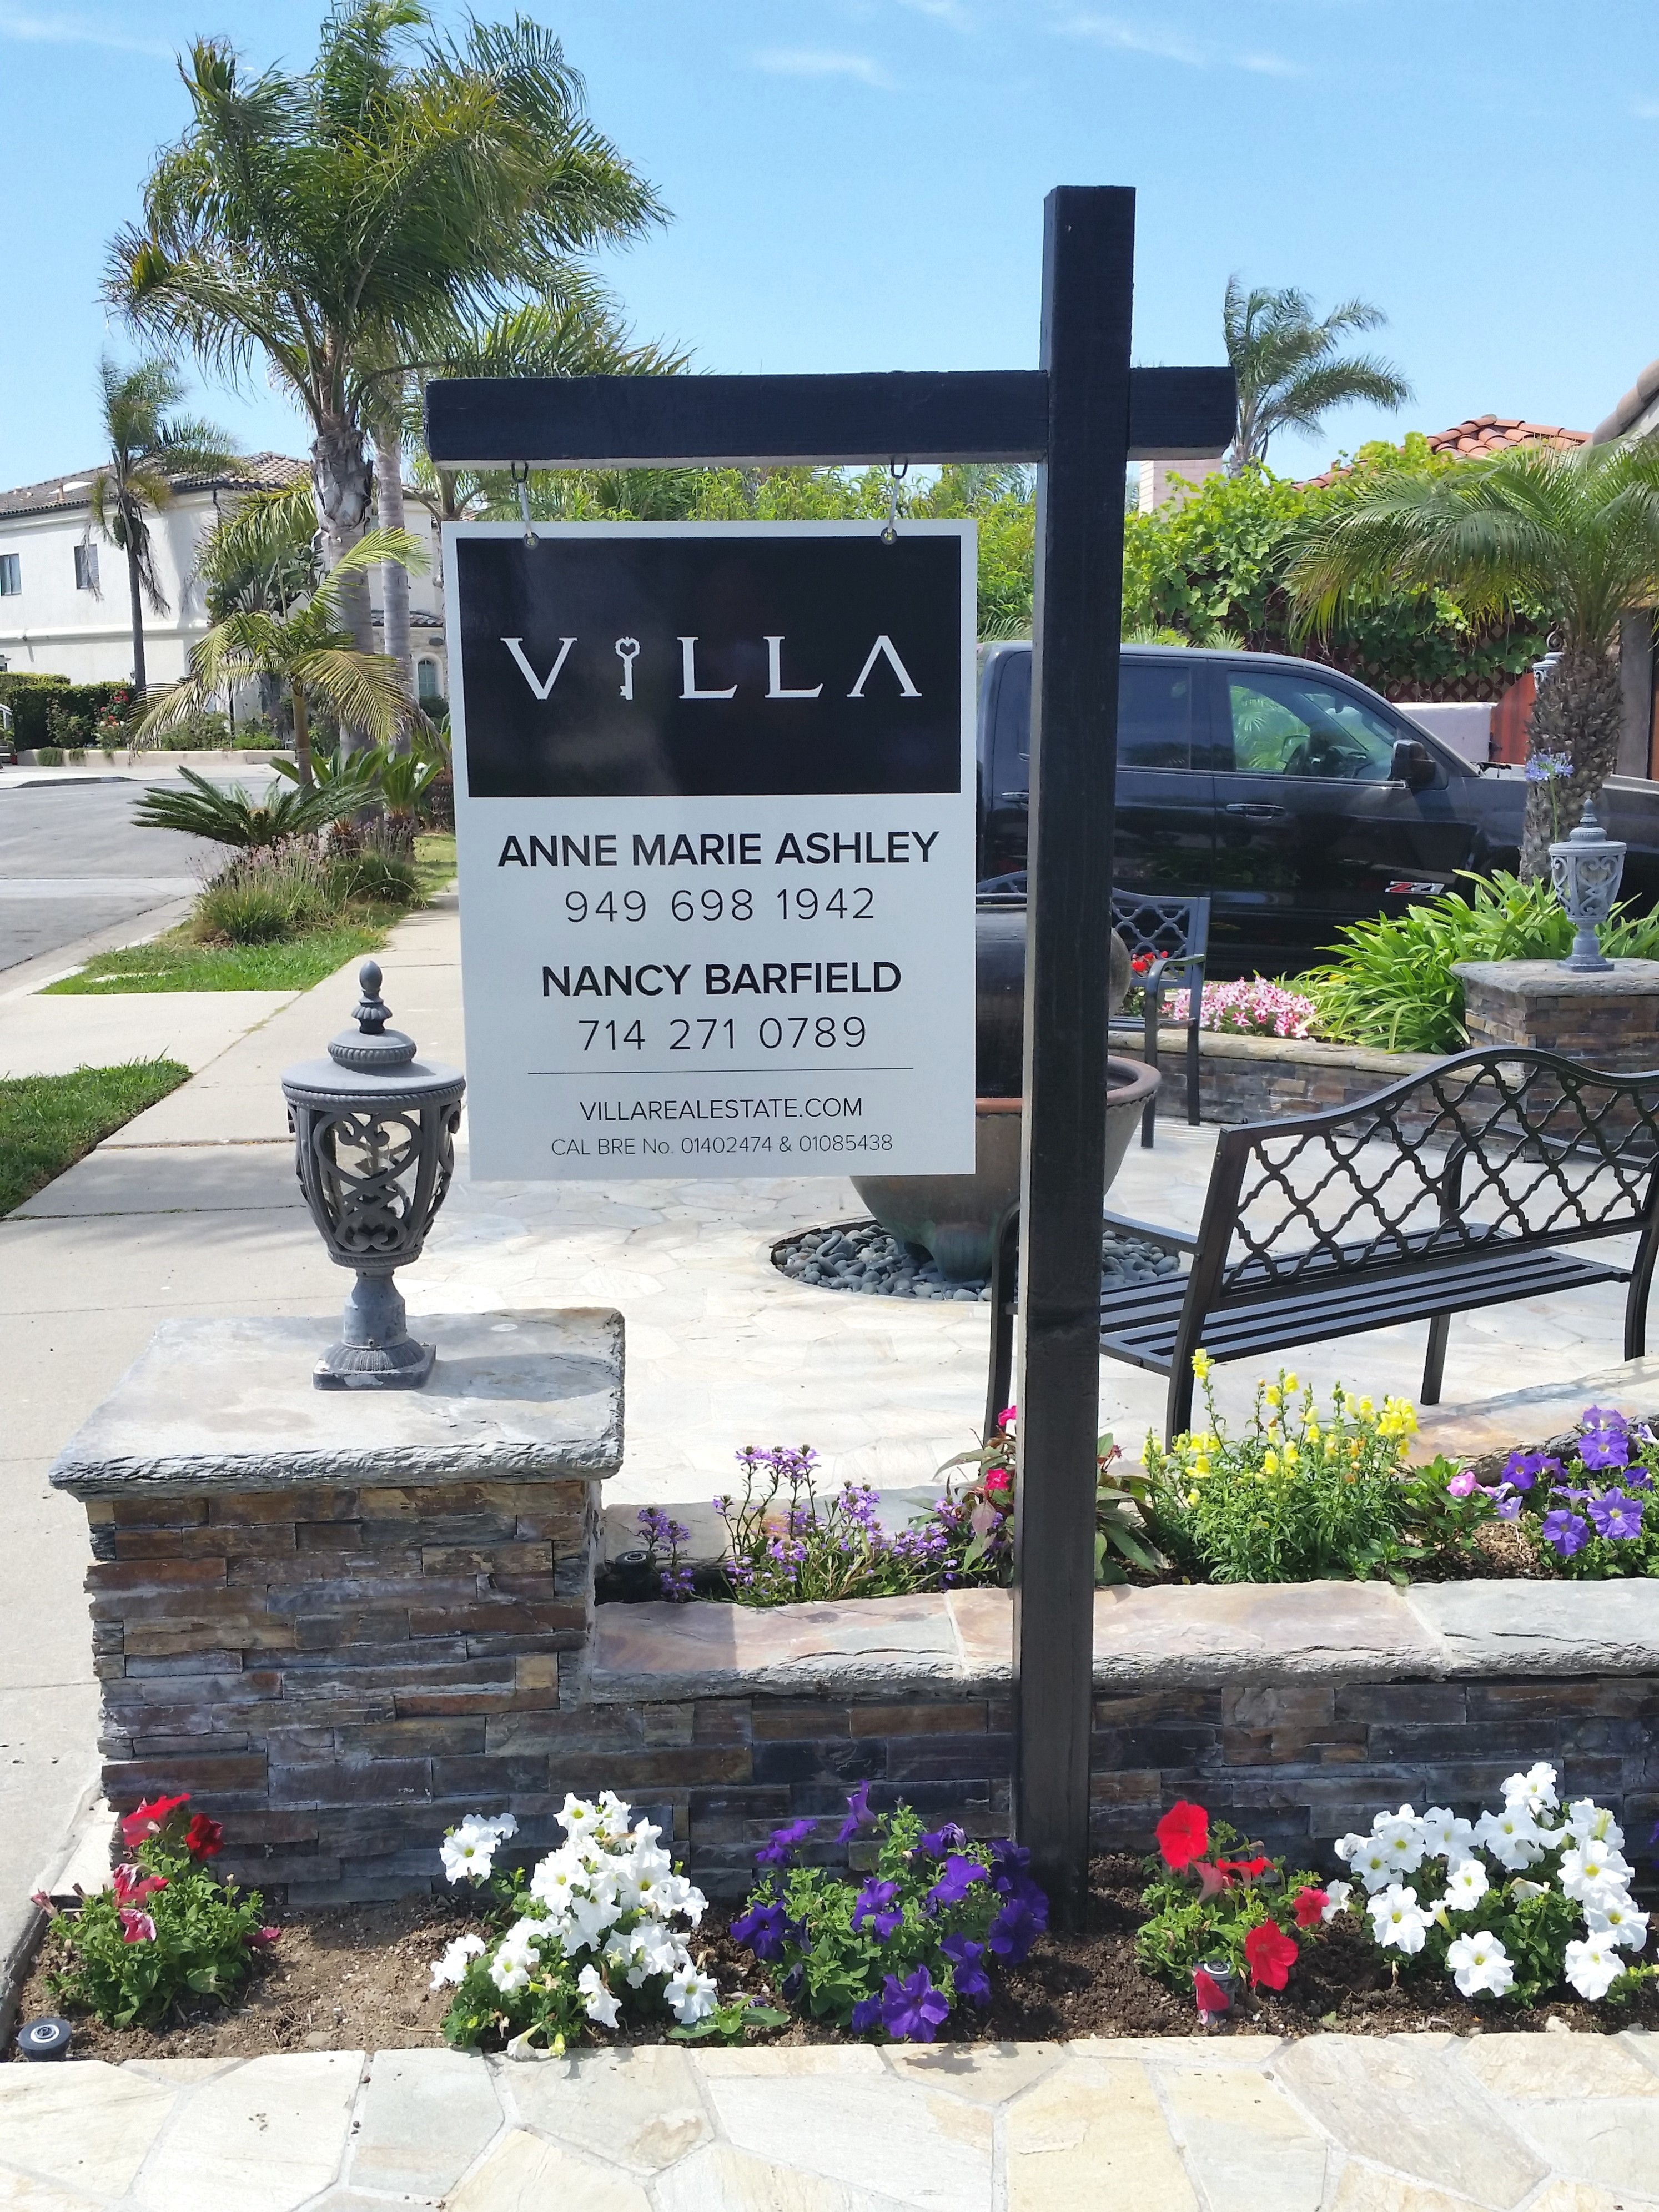 Senior Realtors Use Real Estate Signs